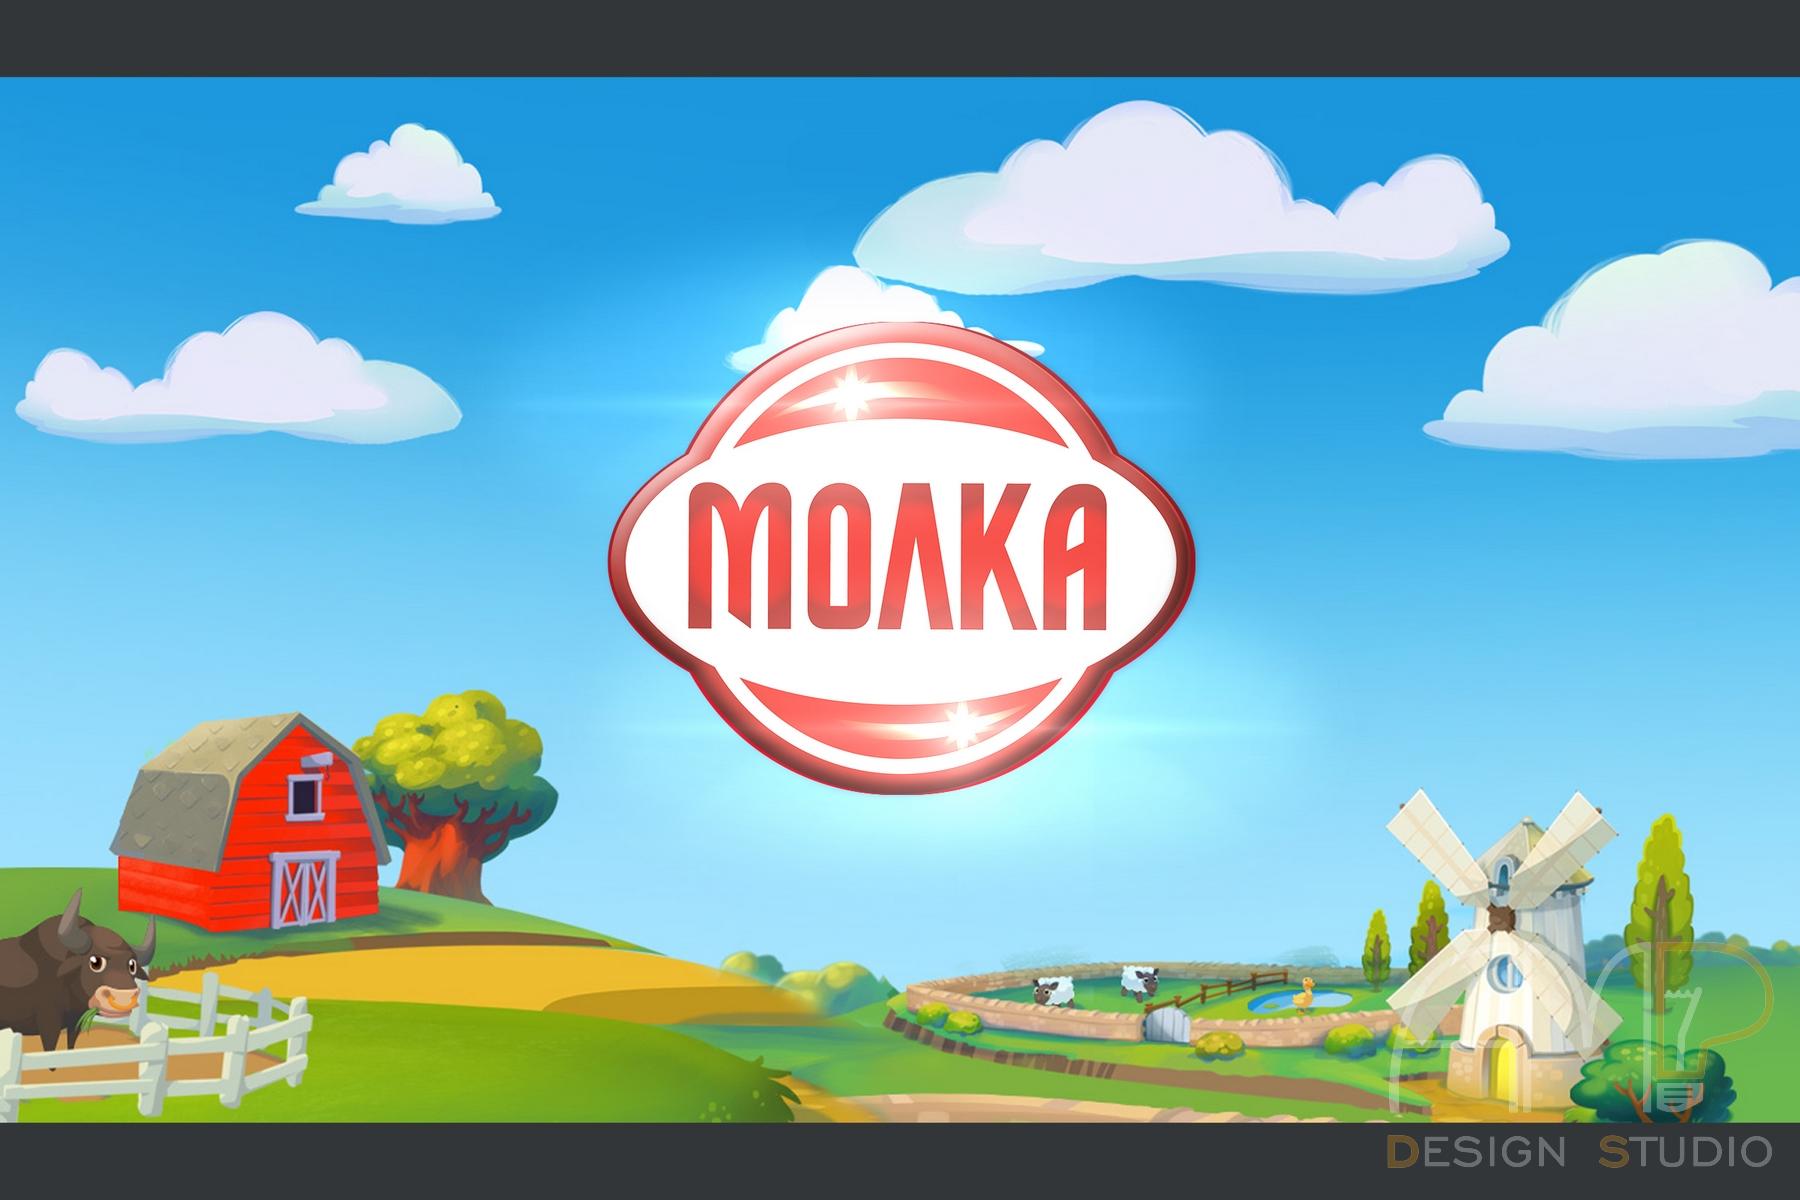 Molka logo